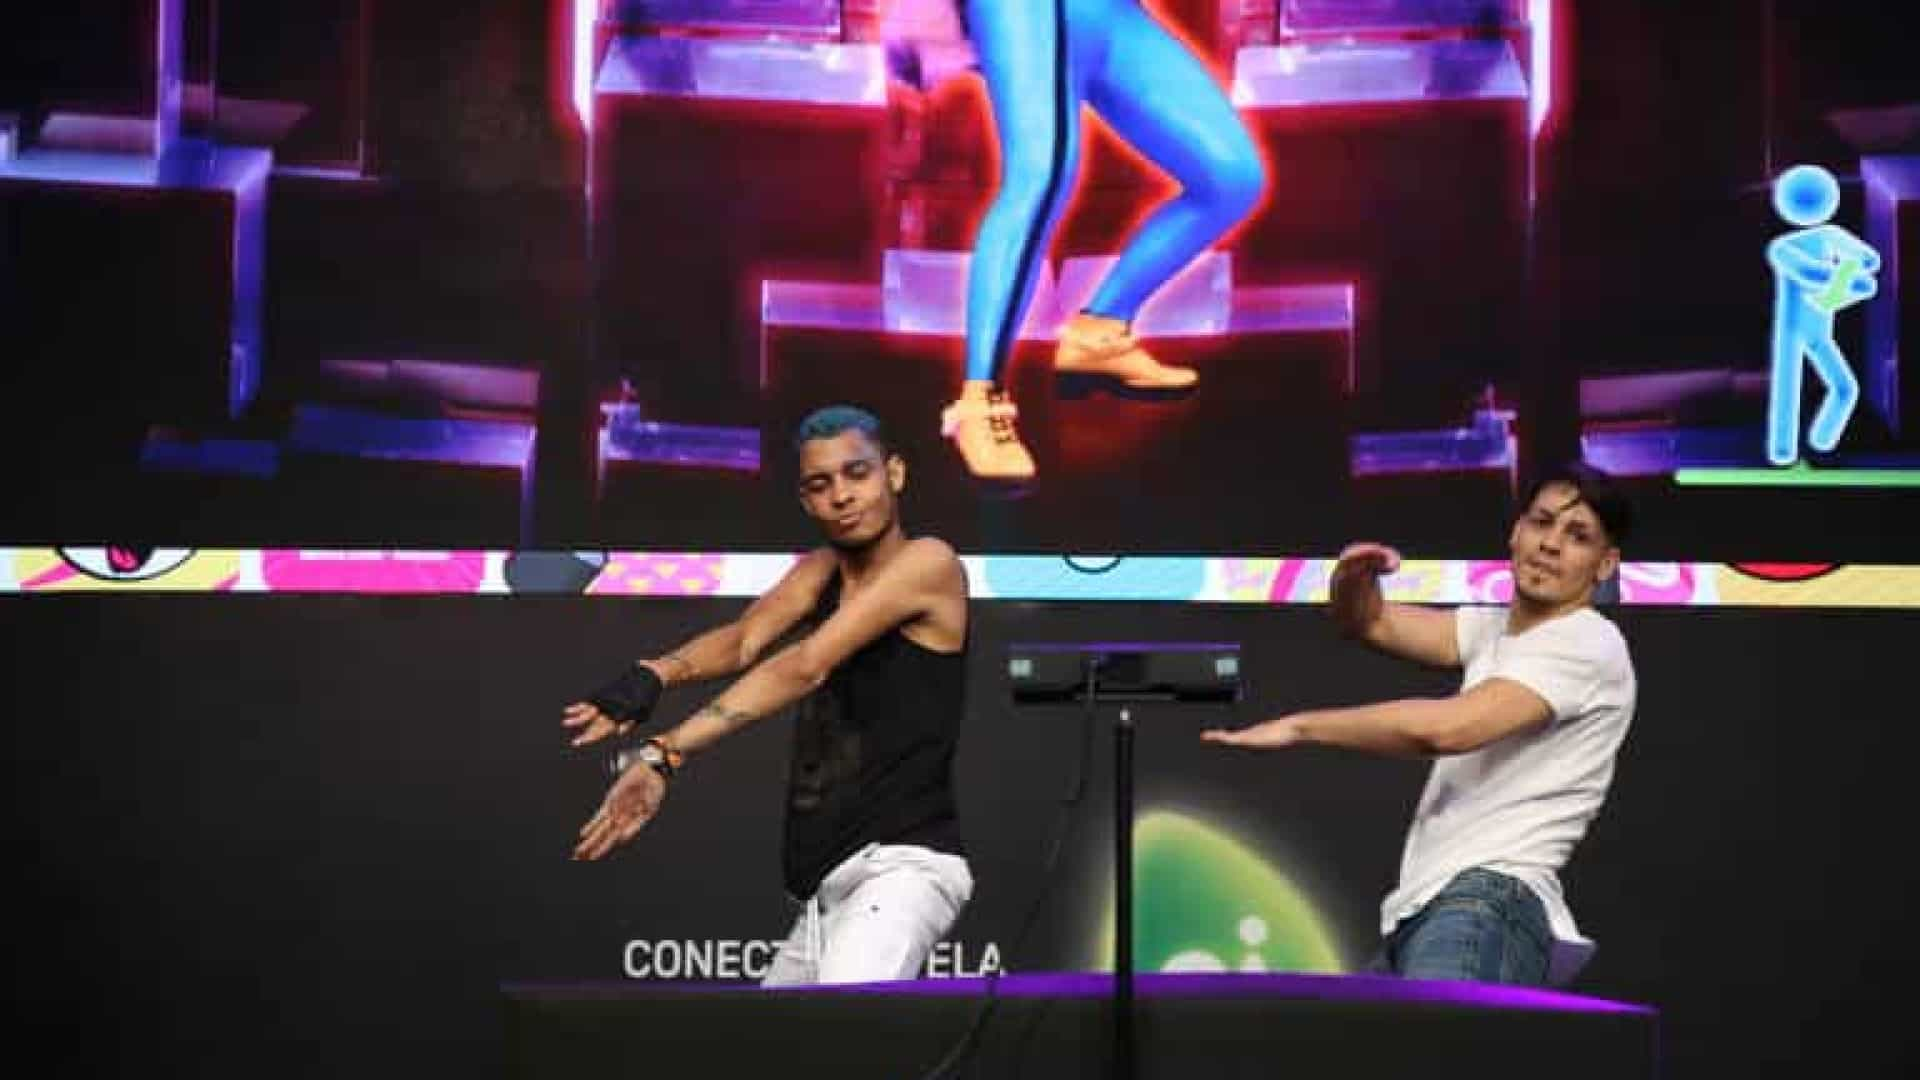 Brasileiro e chilena vencem campeonato latino-americano de 'Just Dance'